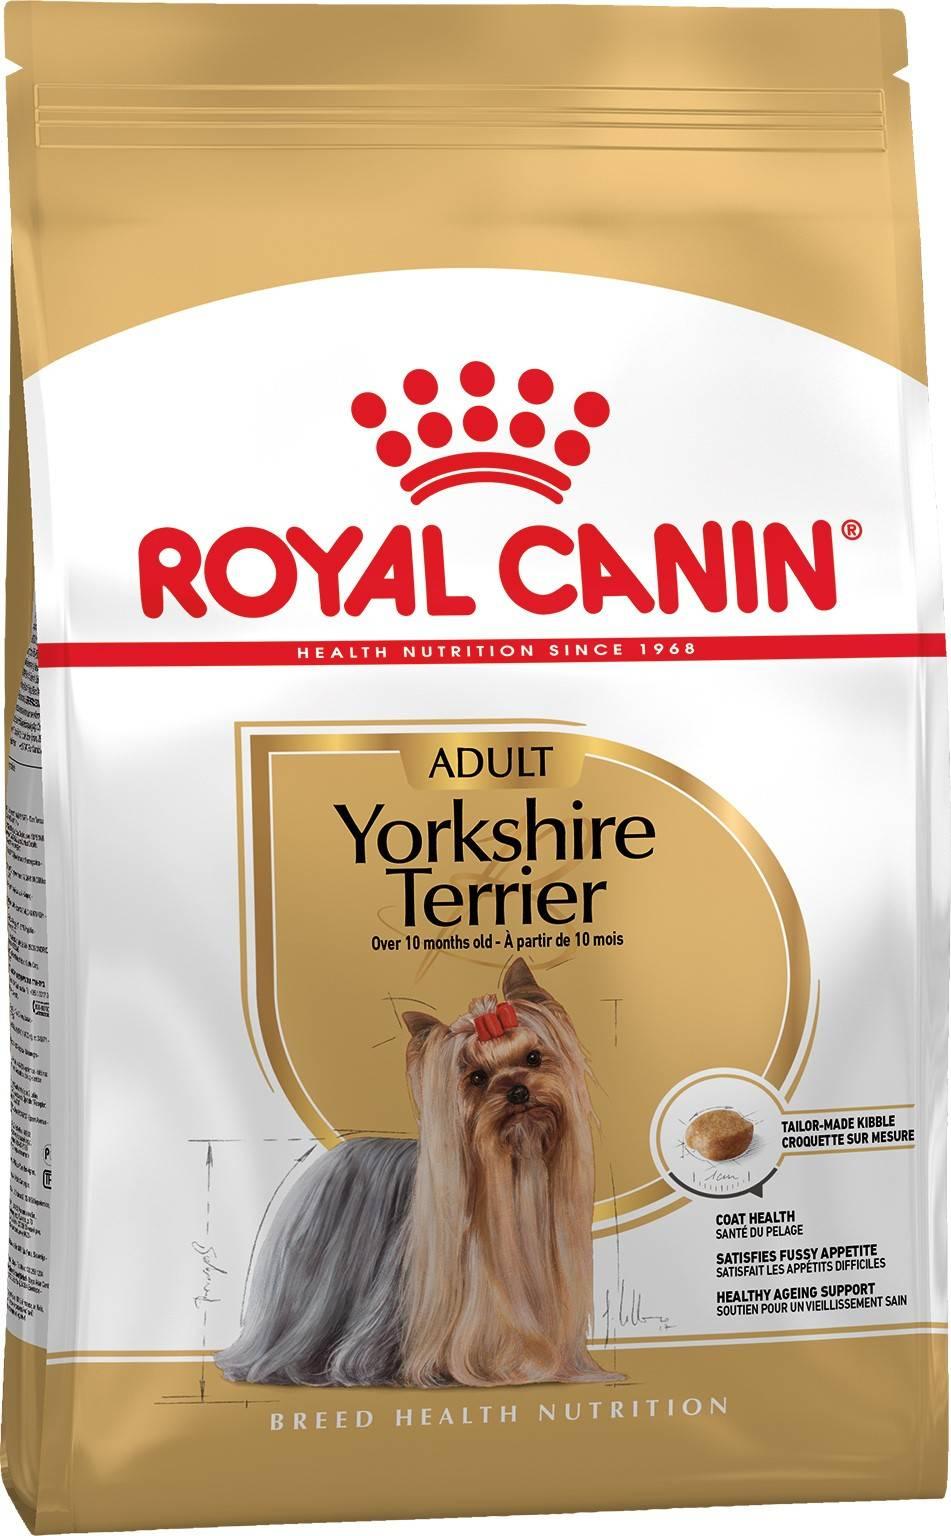 ROYAL CANIN YORKSHIRE TERRIER ADULT сухий корм для дорослих собак породи йоркширський тер'єр